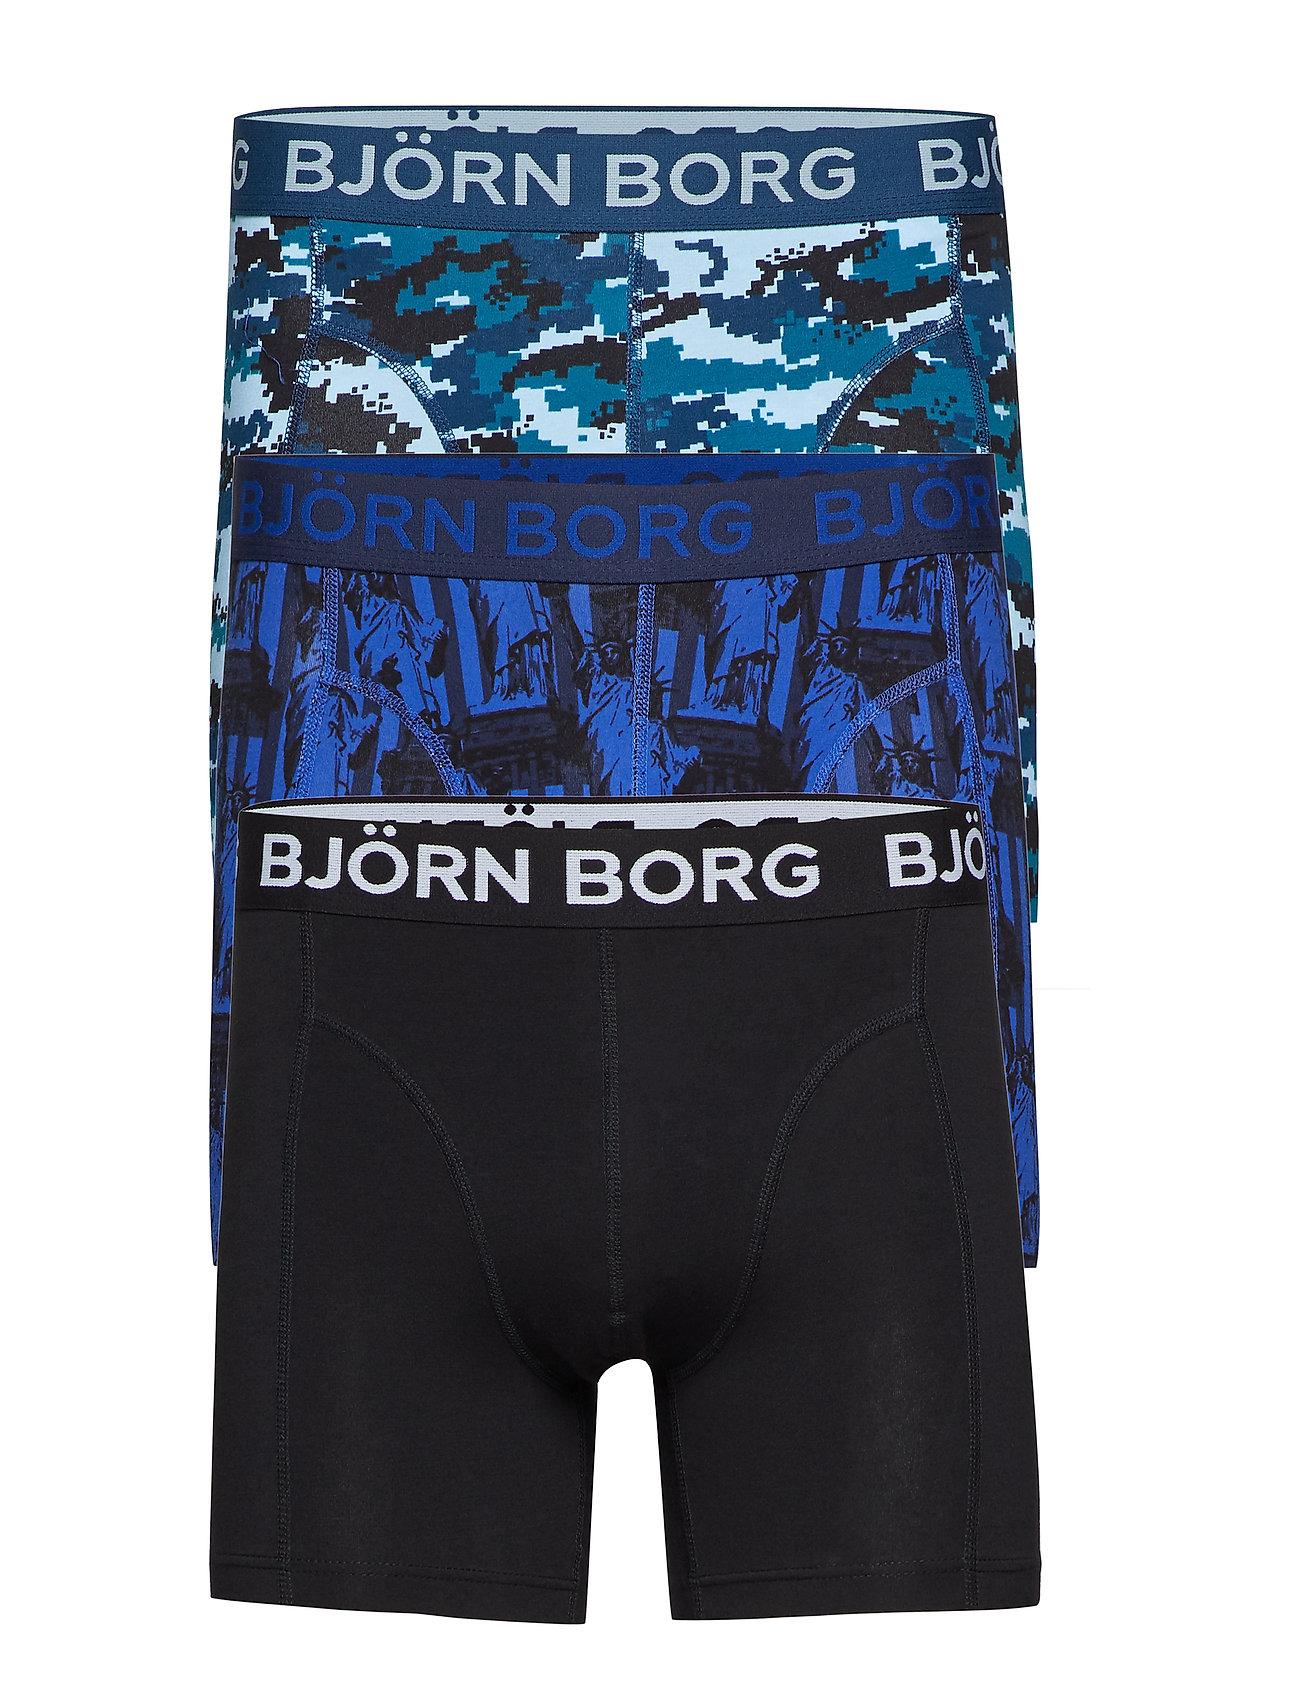 Björn Borg SHORTS BB SILHOUETTE & BB STATUE OF LIBERTY 3p - CORSAIR